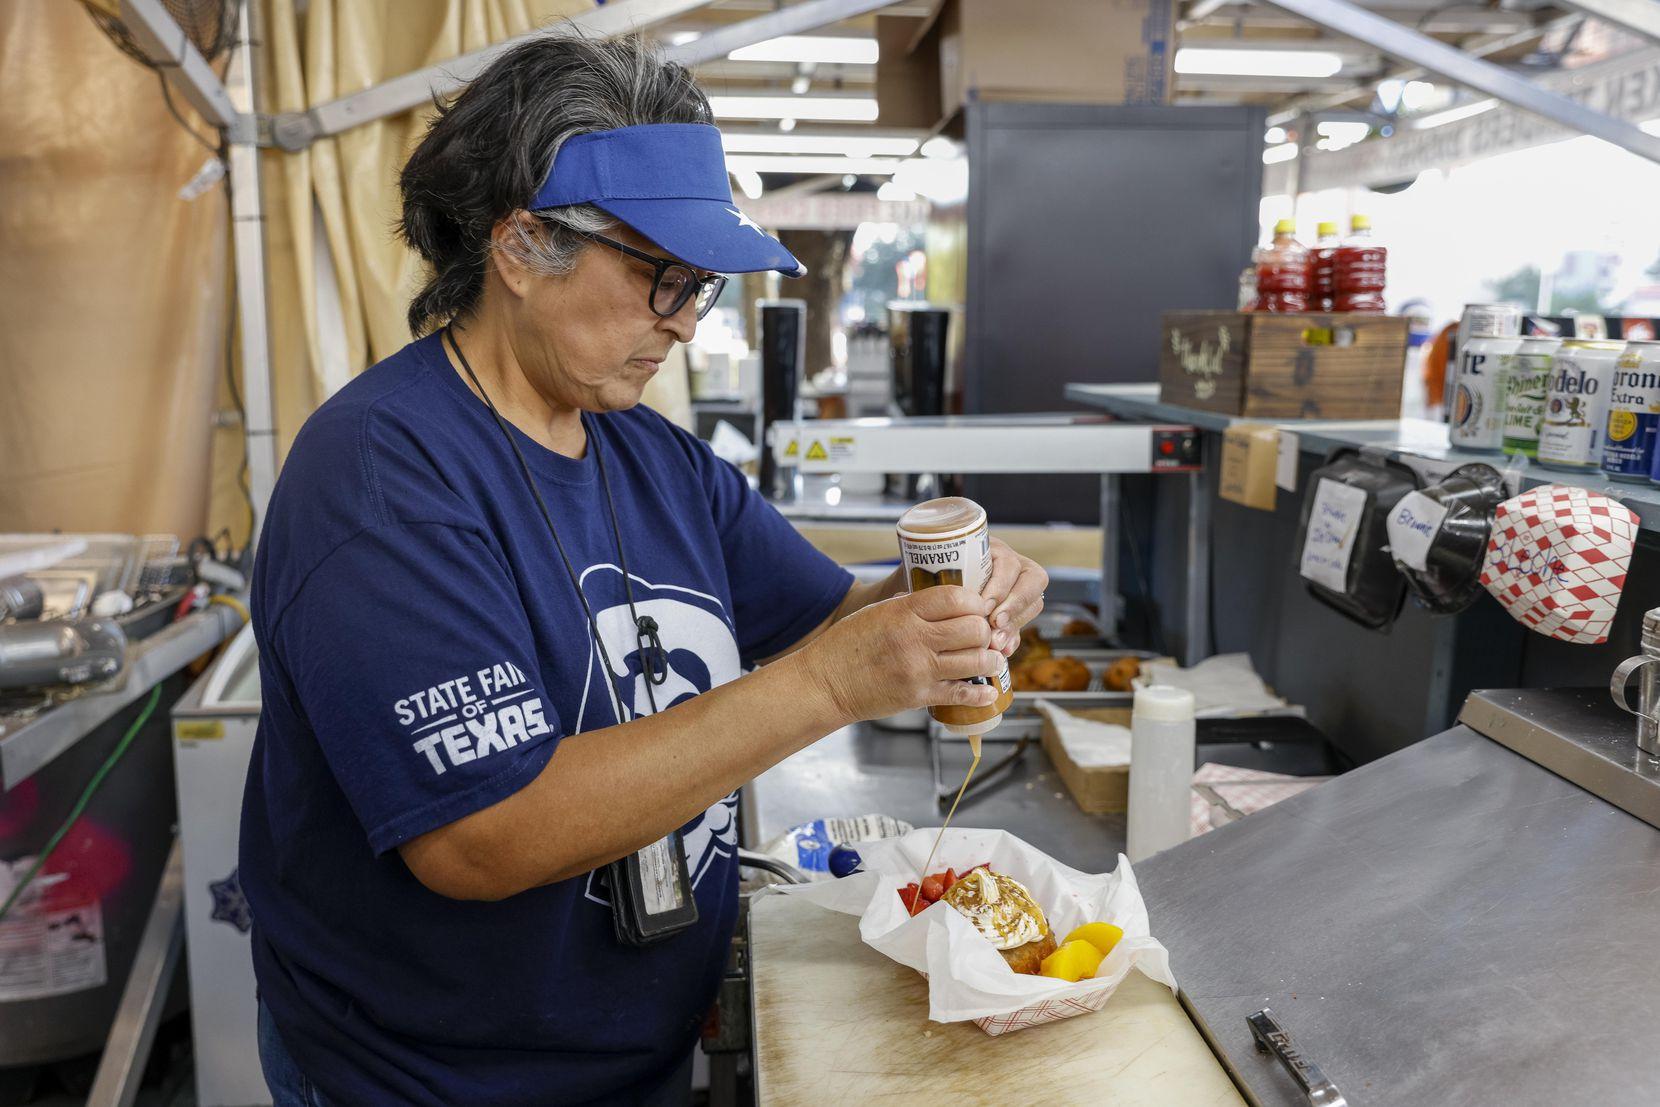 Denise Garza de la Cruz prepares a deep fried chocolate tres leches cake at the State Fair of Texas on Wednesday.